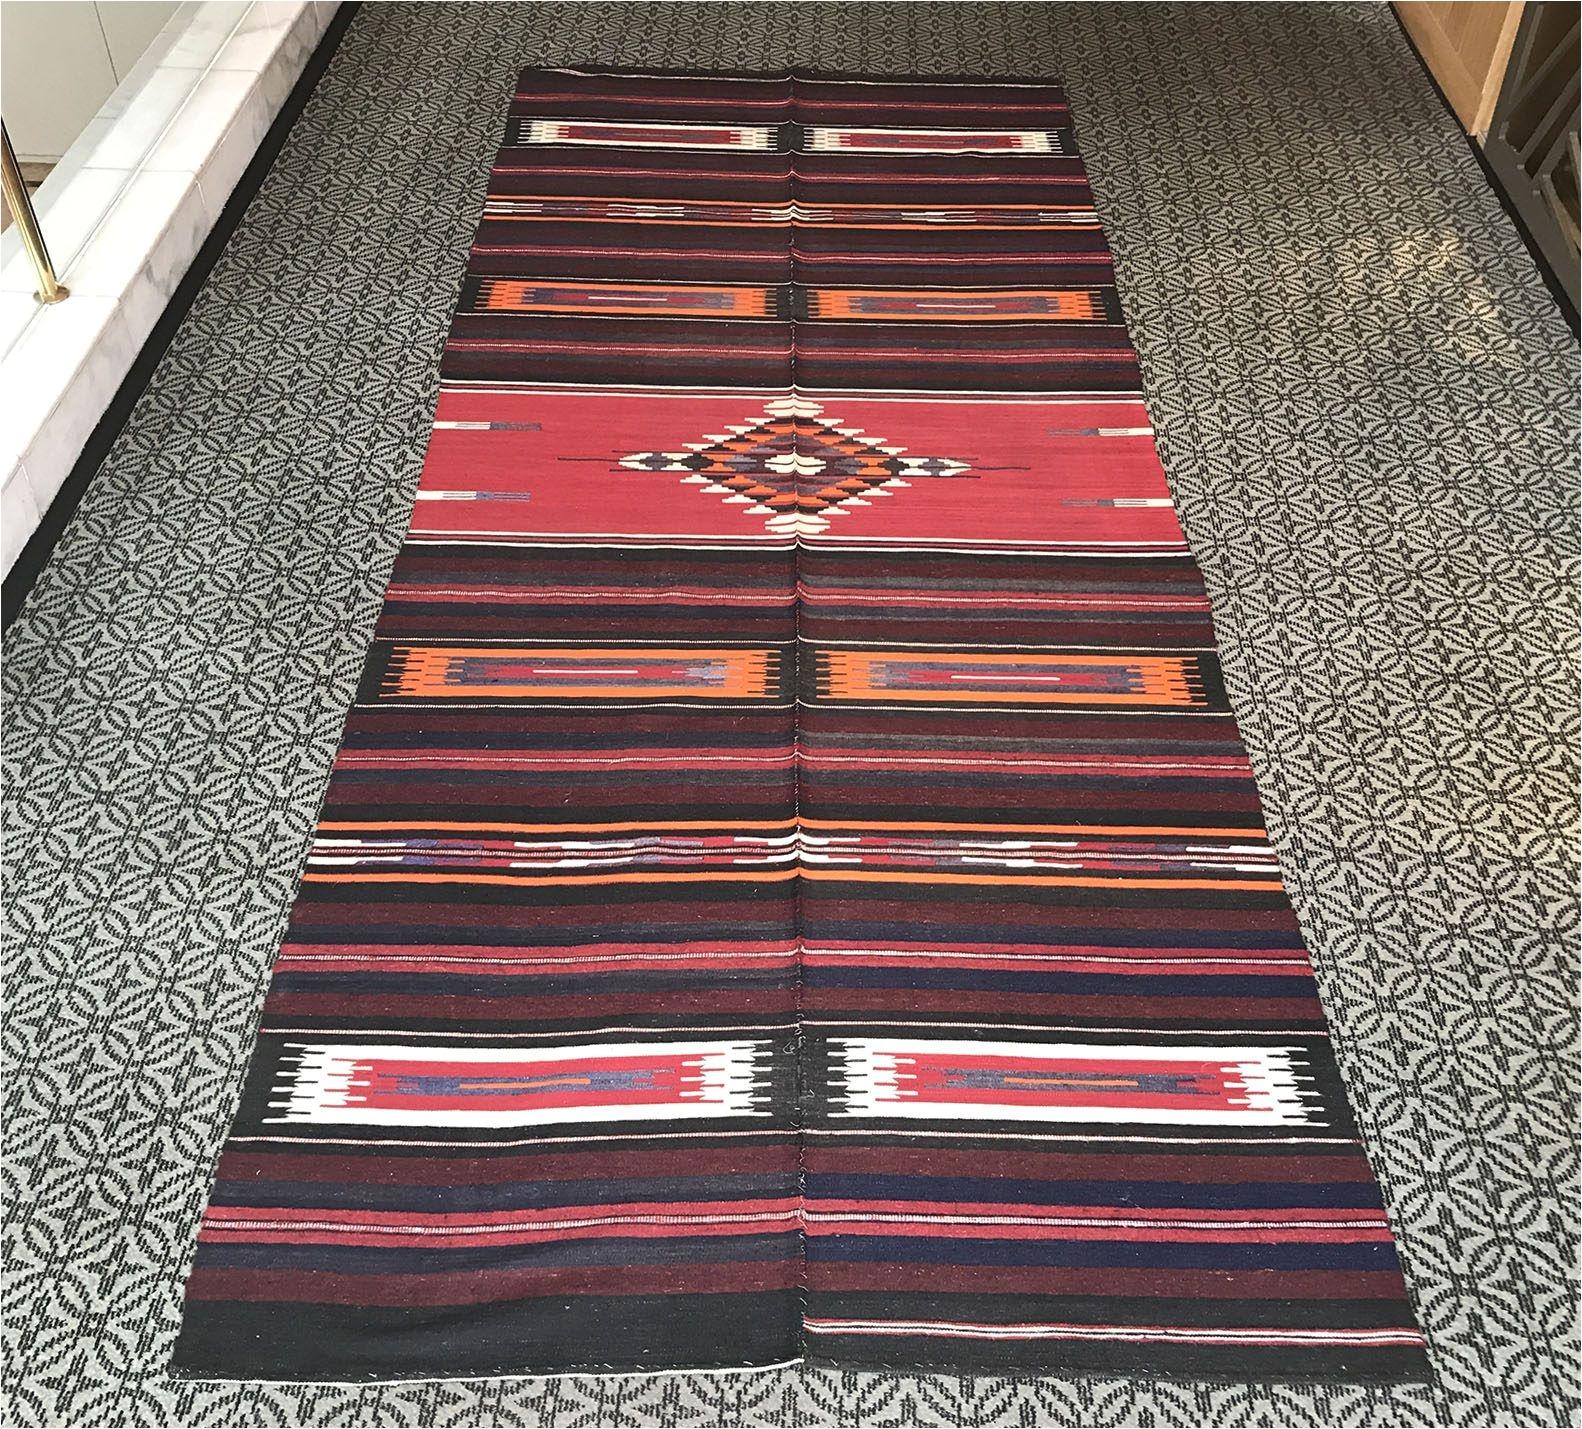 long twin kilim antique kilim 100 years old kilim rug collectible turkish